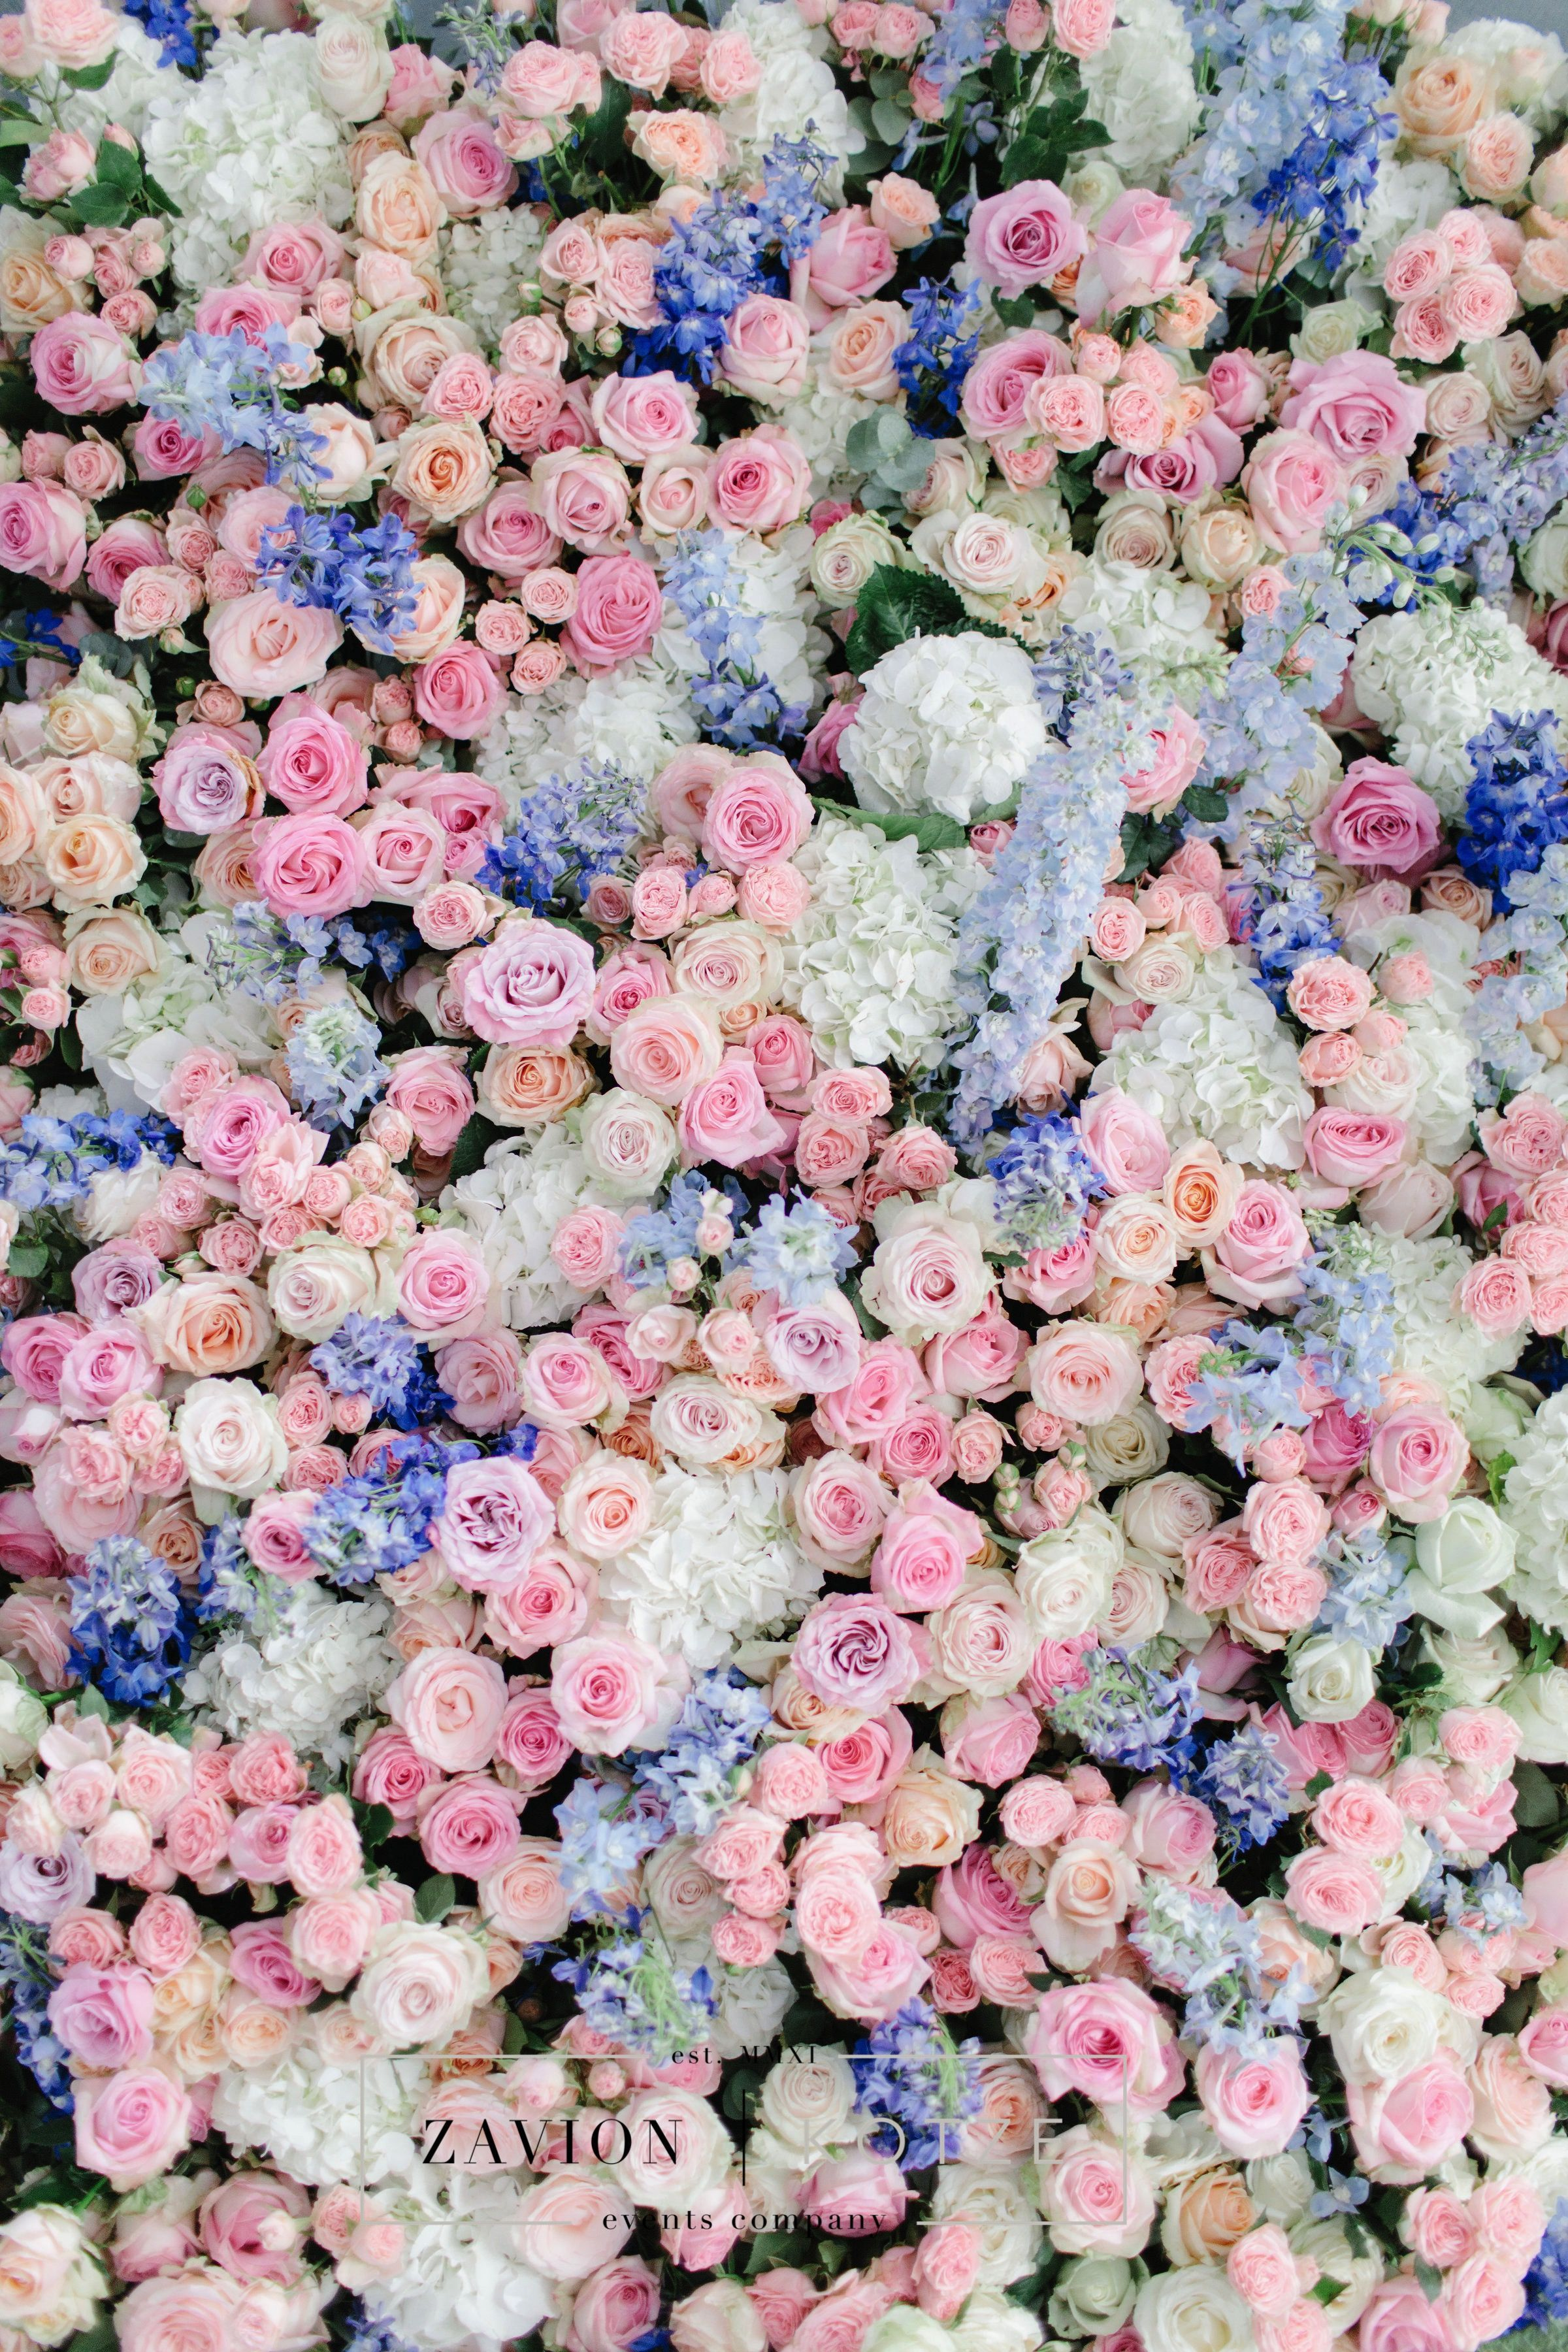 Zavion Kotze Events Company Top Wedding Planner Johannesburg In 2020 Flower Wall Wedding Flower Wall Backdrop Flower Phone Wallpaper